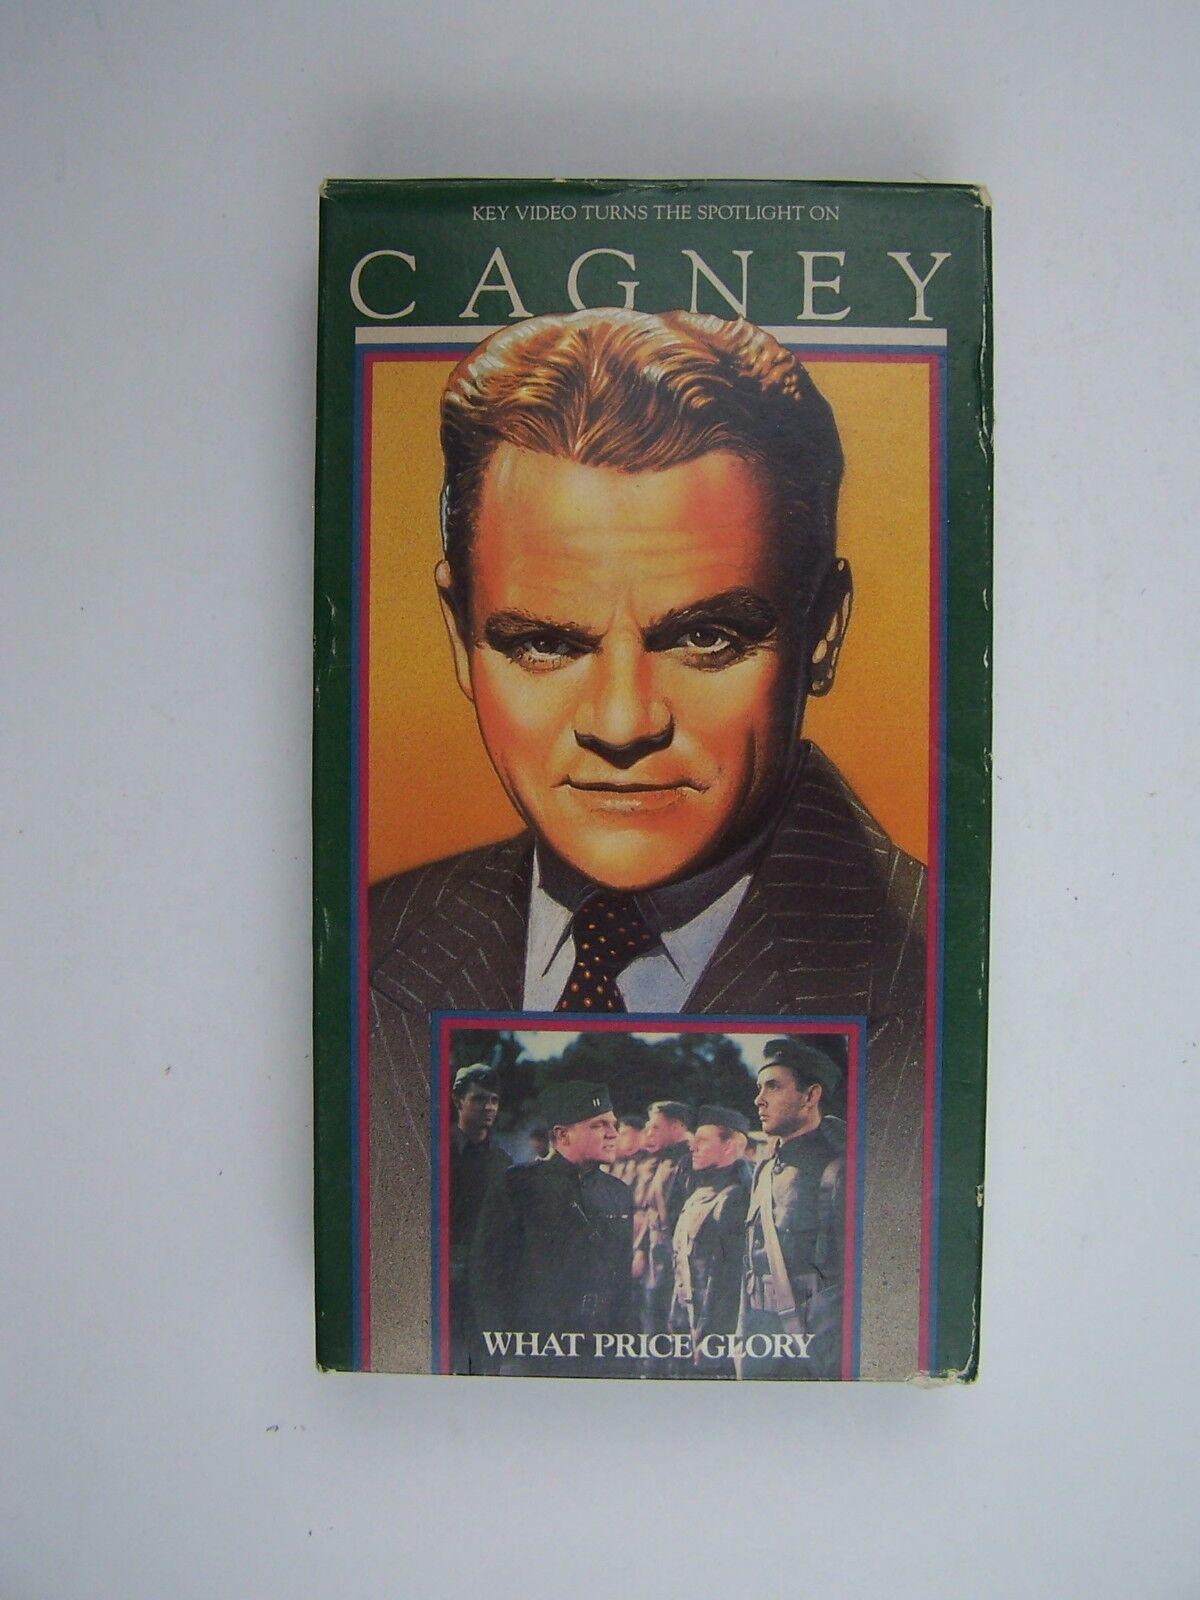 What Price Glory VHS James Cagney, Corinne Calvet 86162